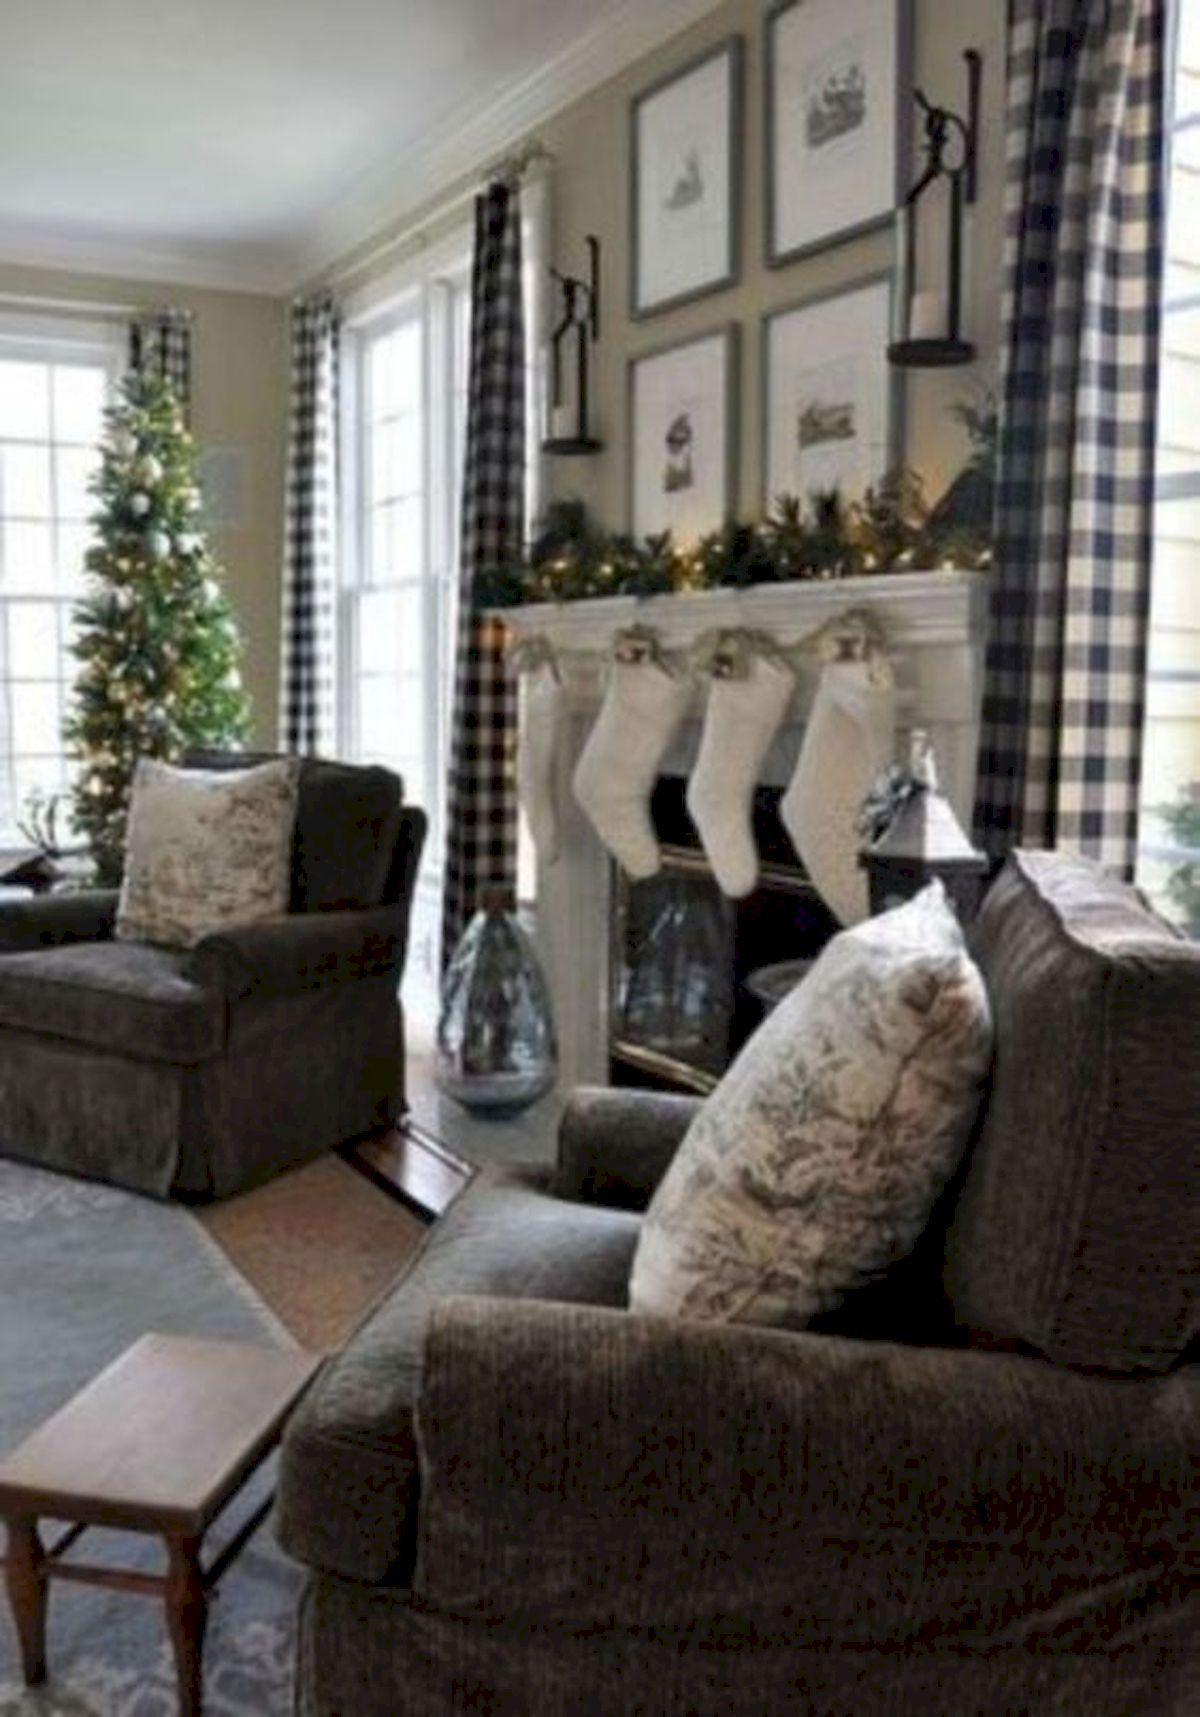 50 Adorable Modern Farmhouse Living Room Curtains Ideas (6 ... on Farmhouse Curtain Ideas For Living Room  id=52840